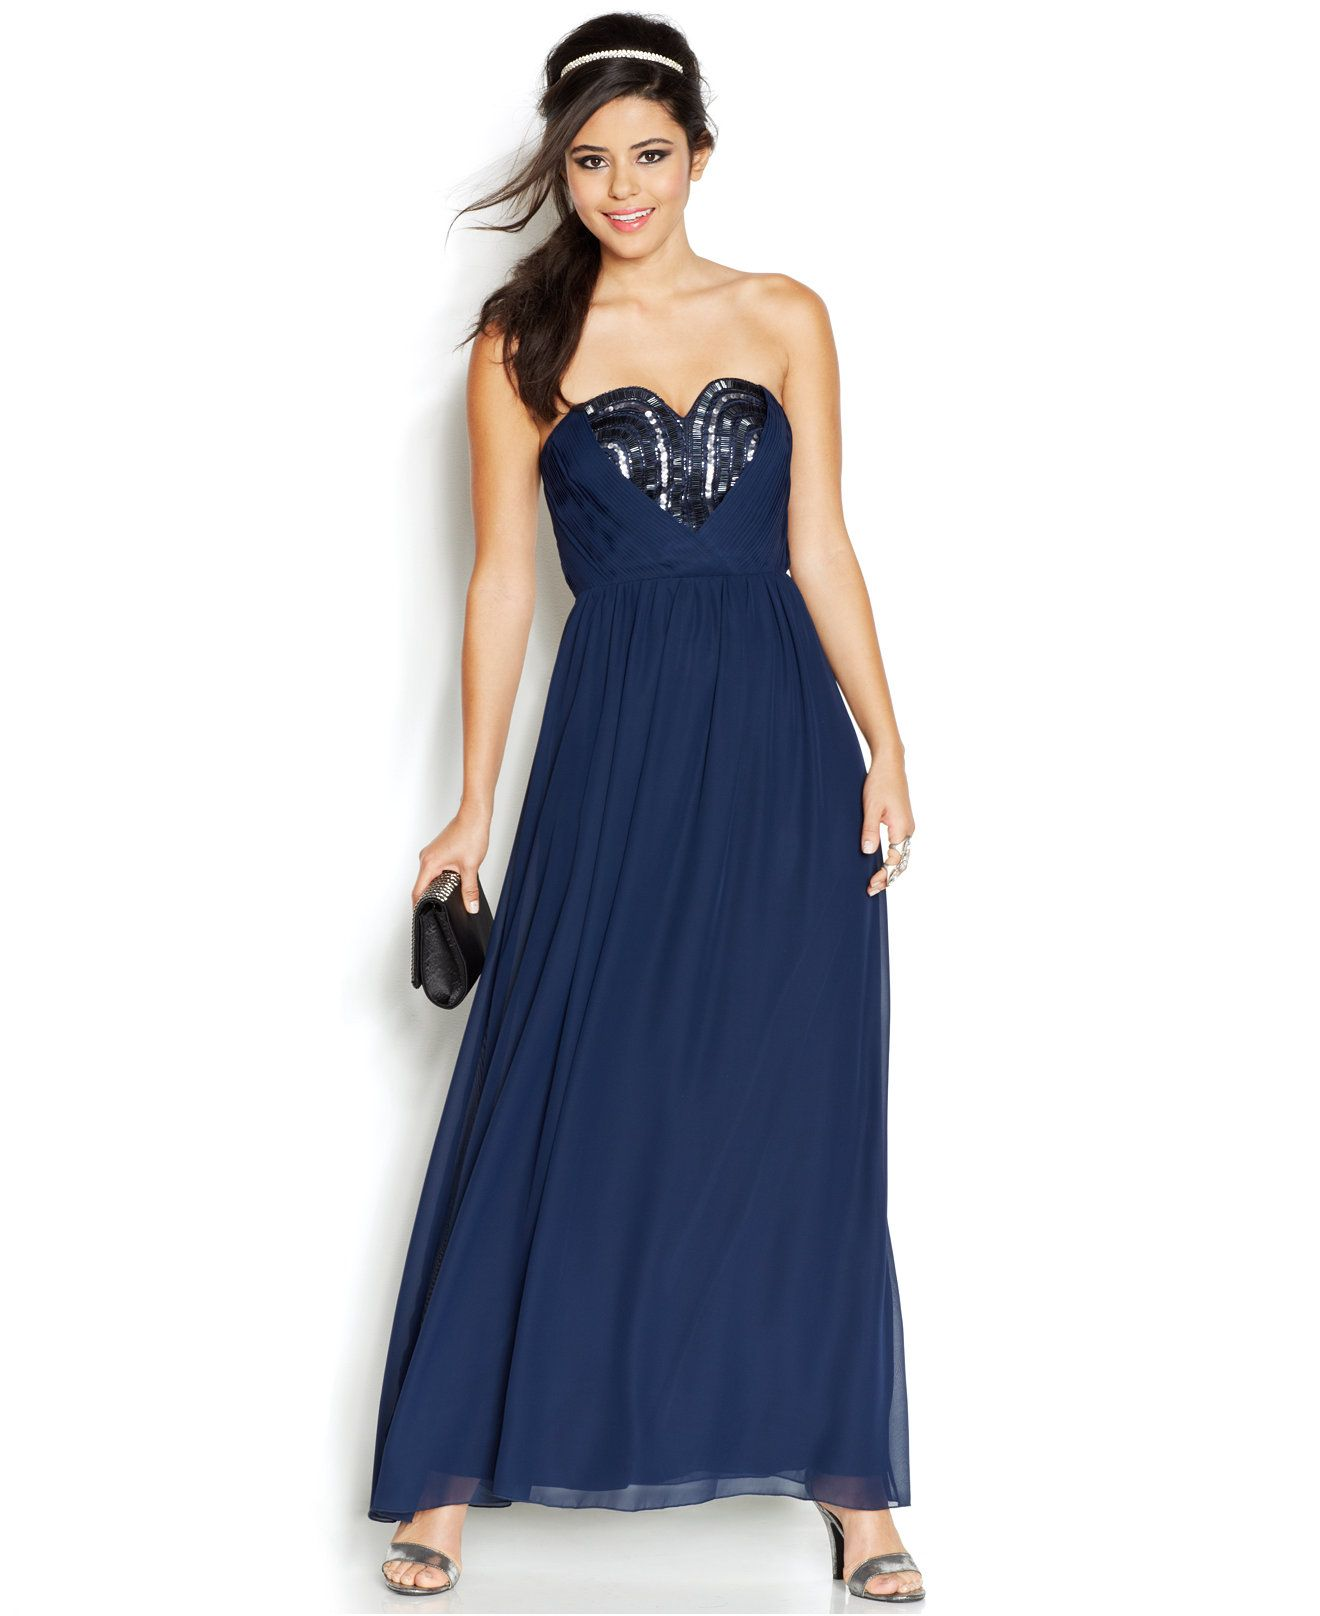 Top dresses to wear to a wedding  Trixxi Juniorsu Strapless Beaded Gown  Macyus  Fashion  Pinterest